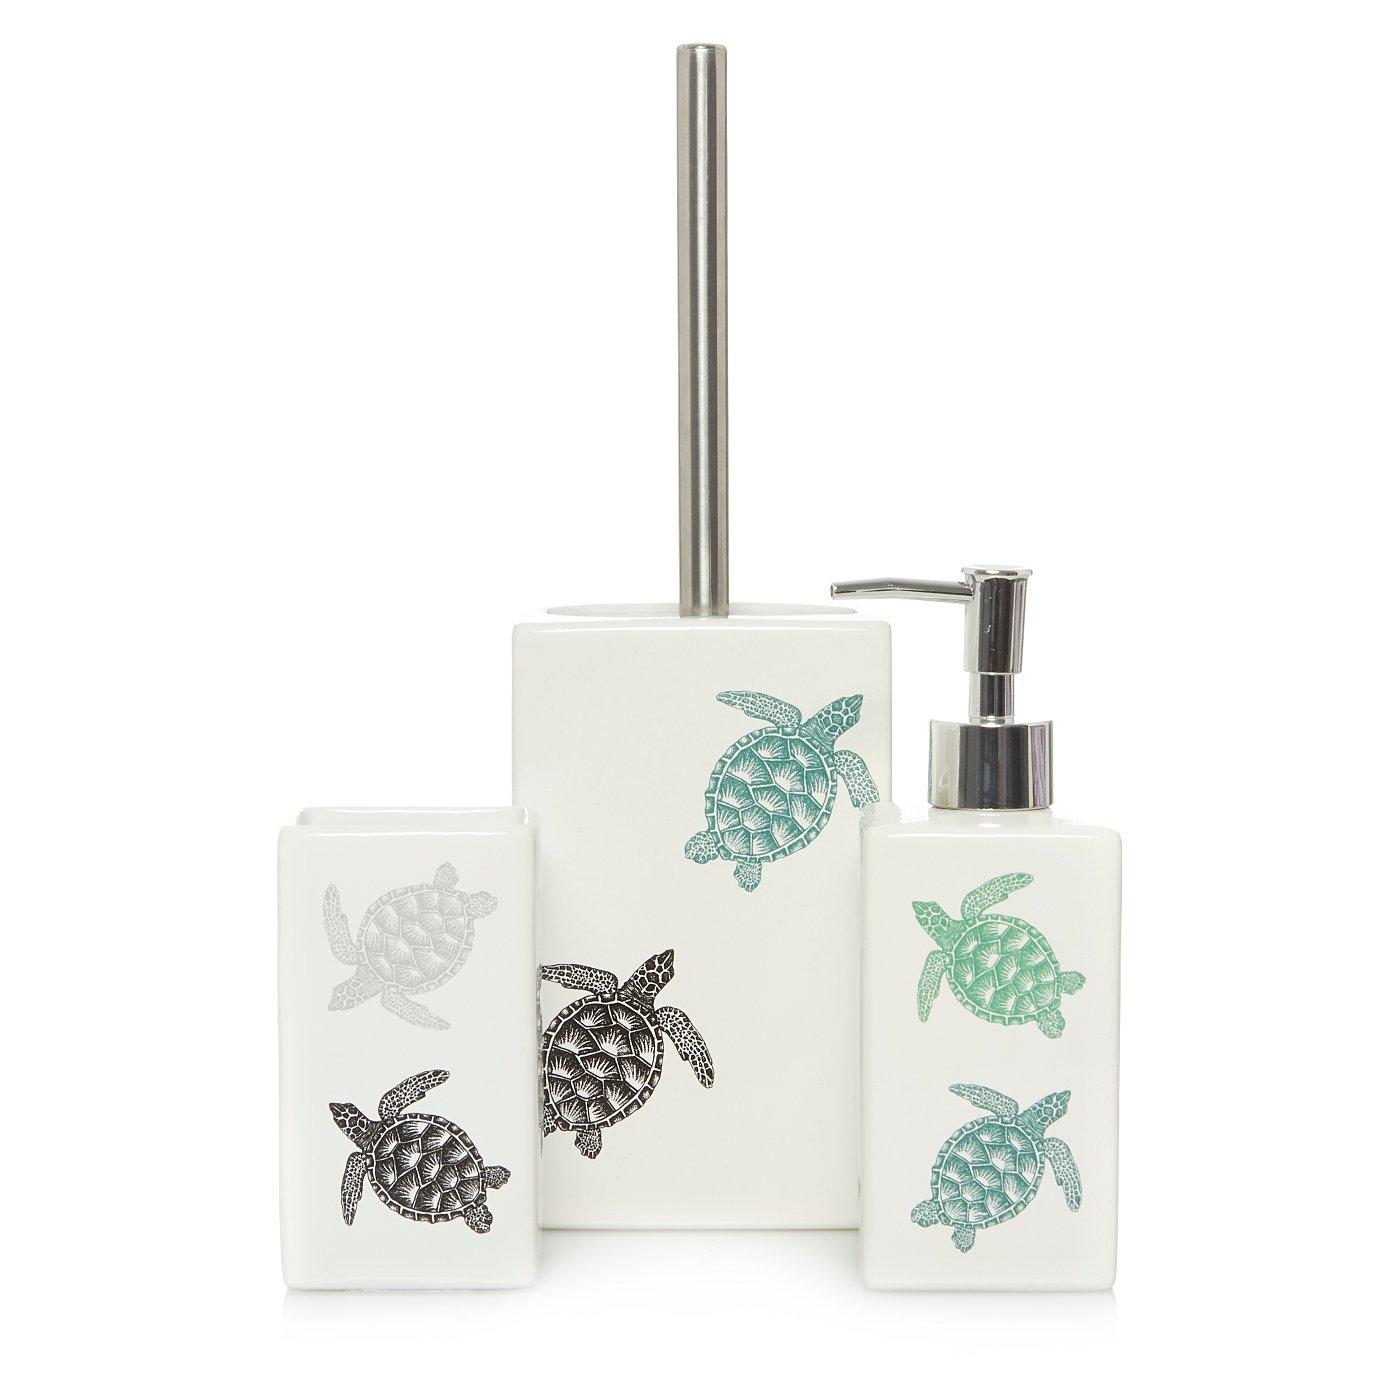 Turtle Bath Accessories Range | Bathroom Accessories | George at ASDA